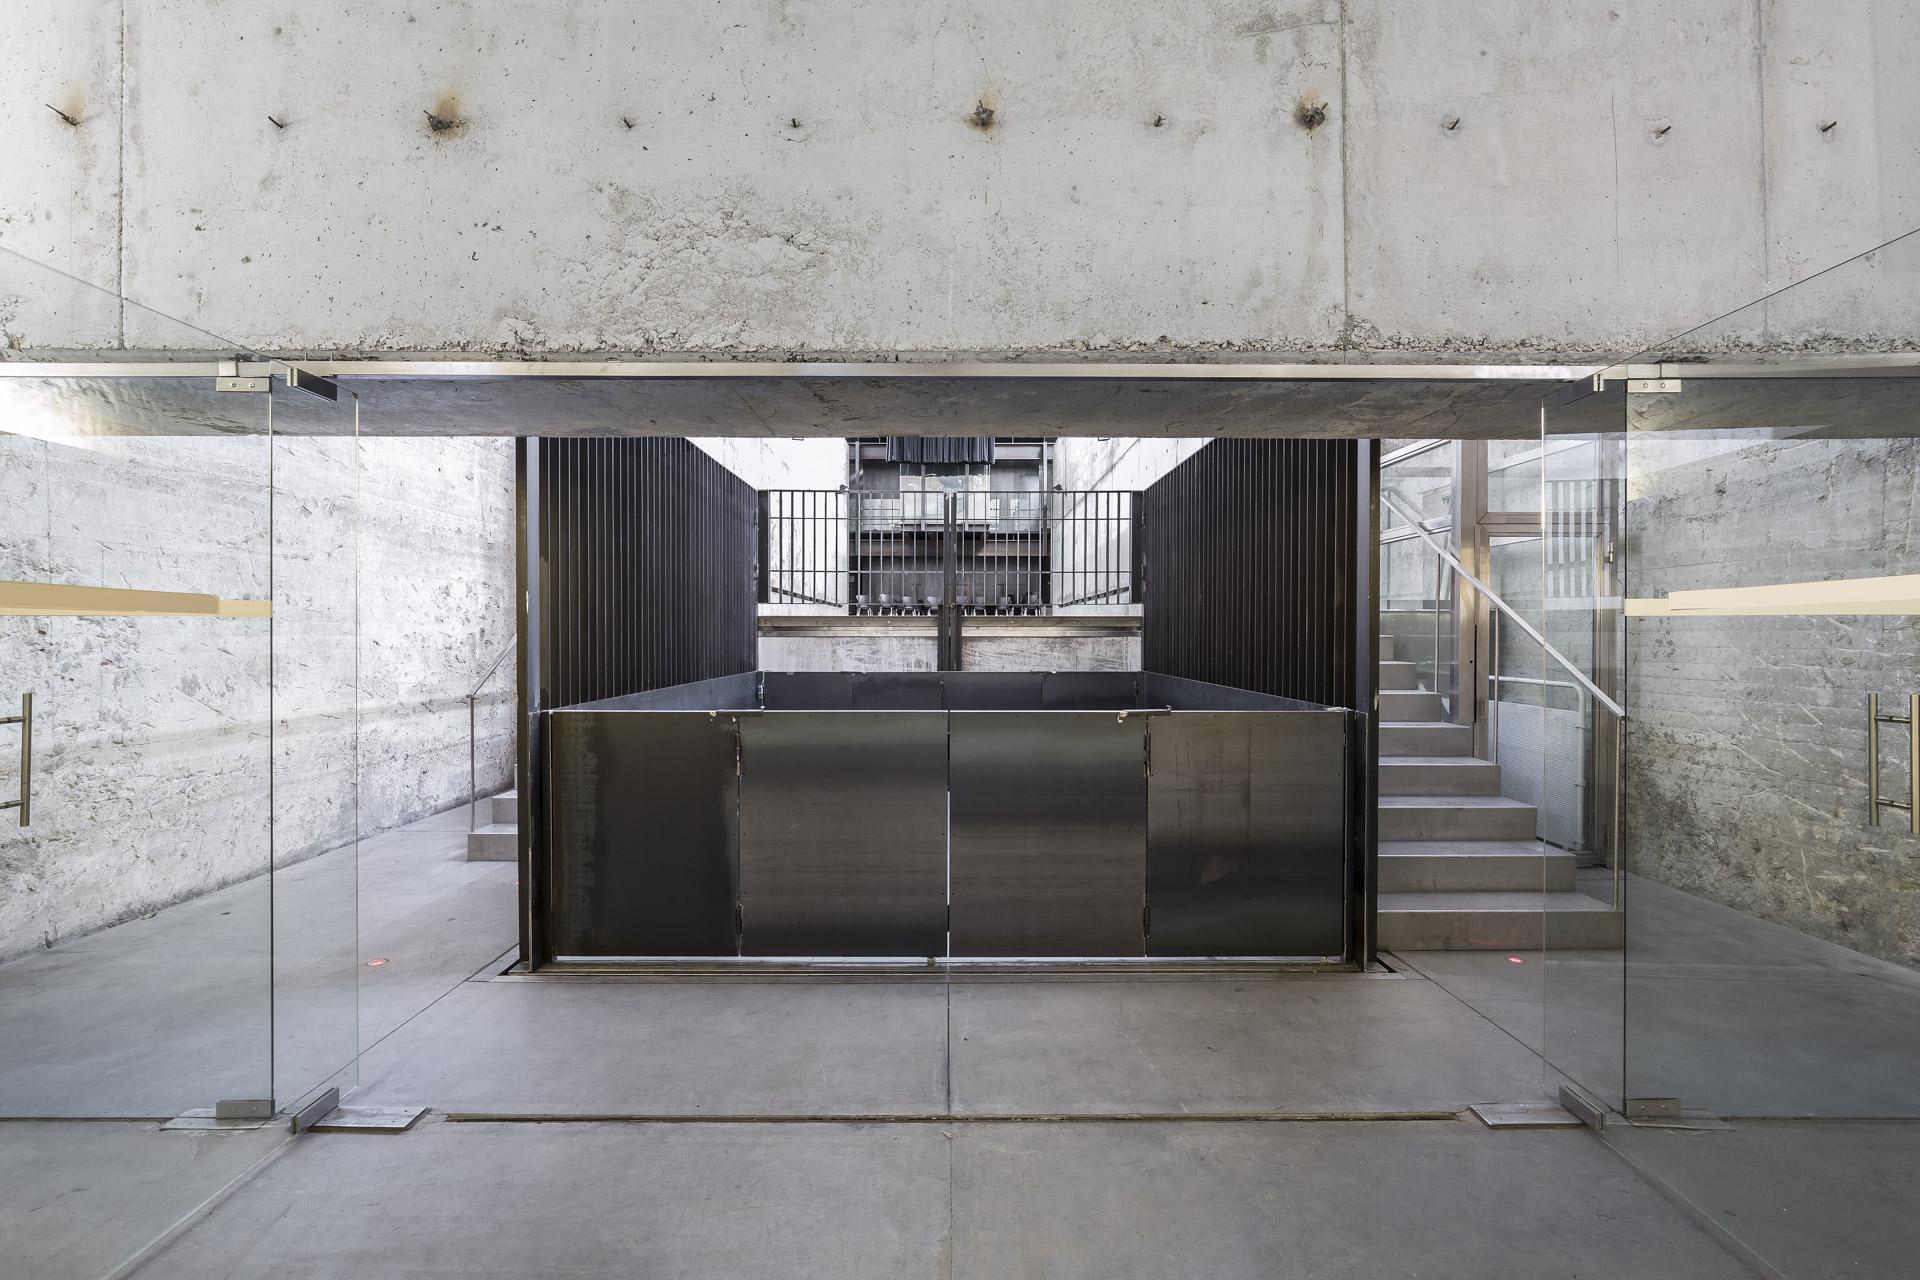 fotografia-arquitectura-madrid-nuevos-ministerios-elorza-german-cabo-17